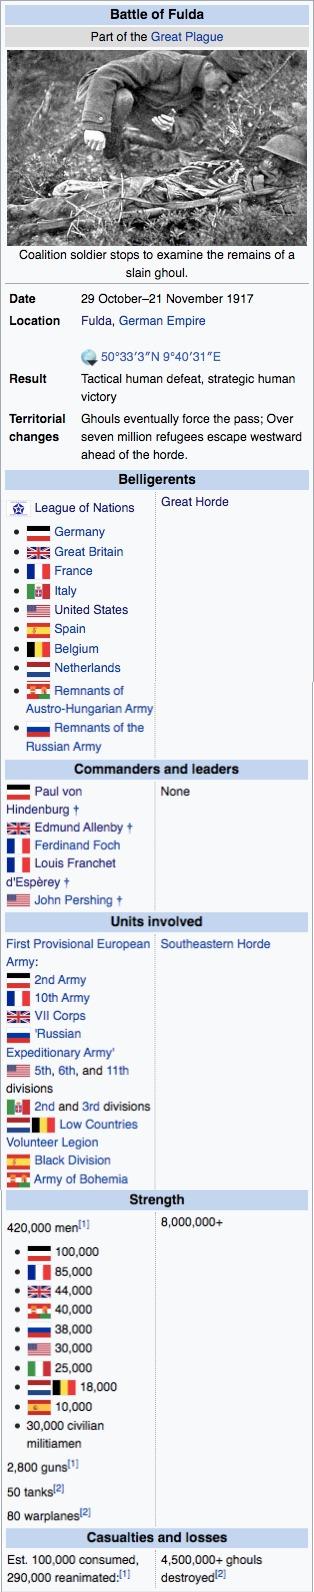 BattleOfFuldaComplete.jpeg